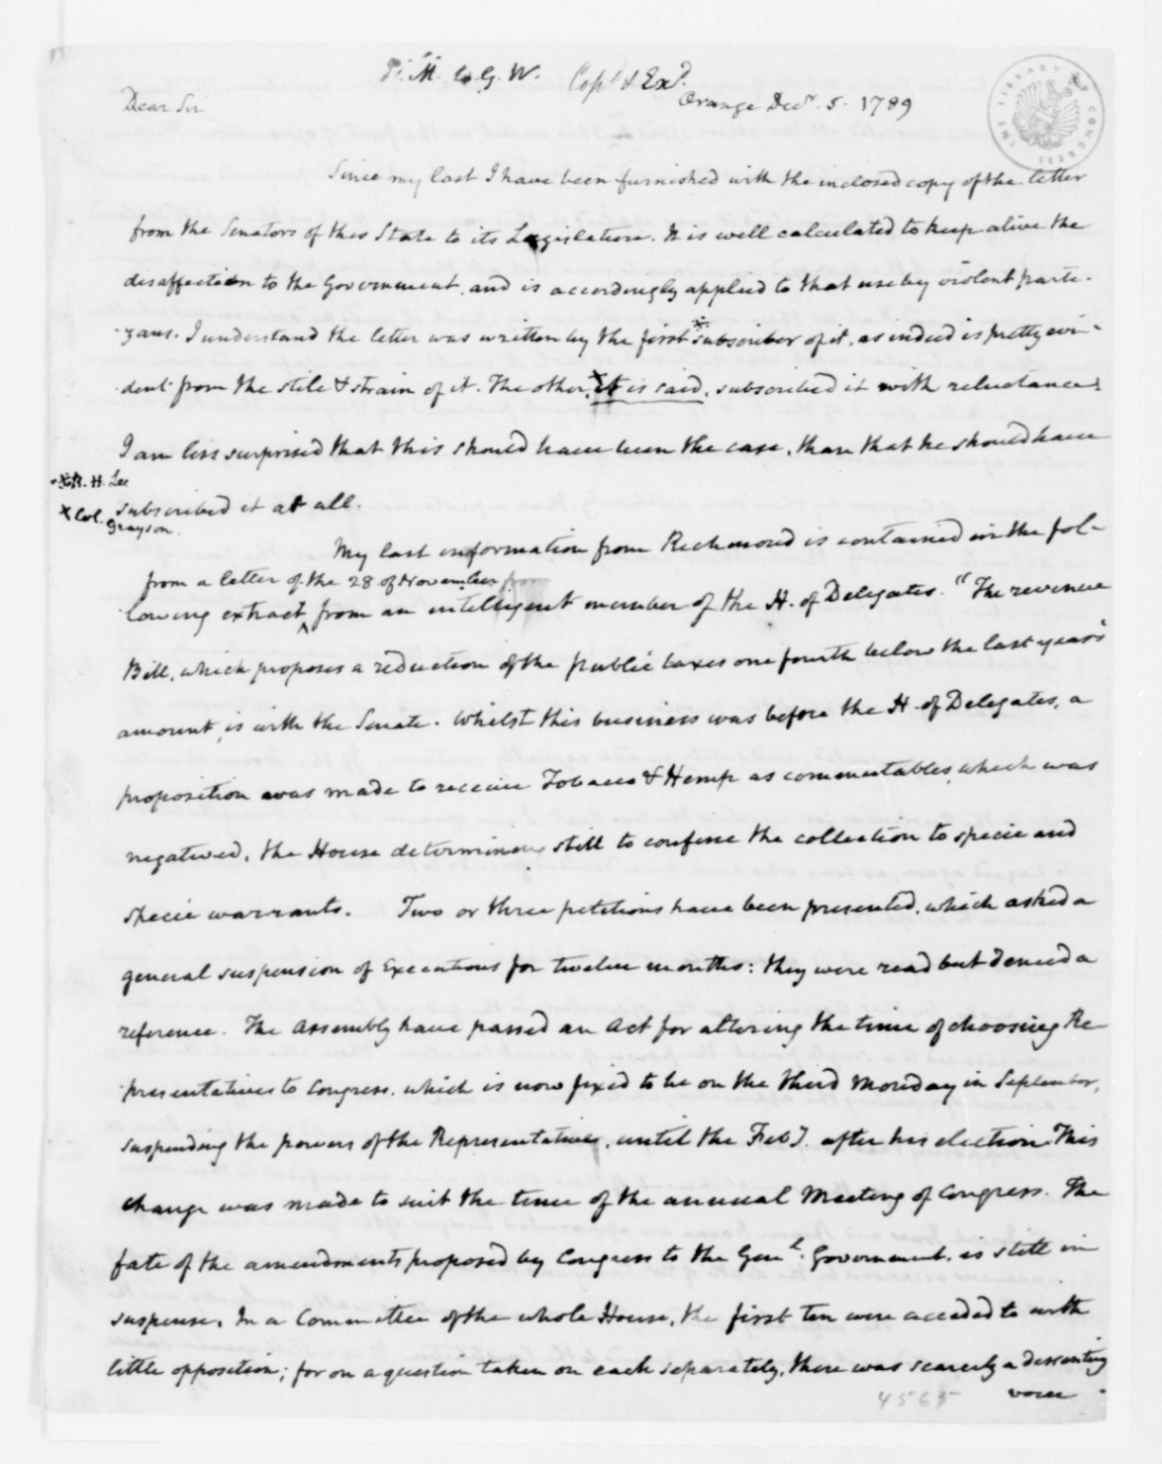 James Madison letter to George Washington, December 5, 1789